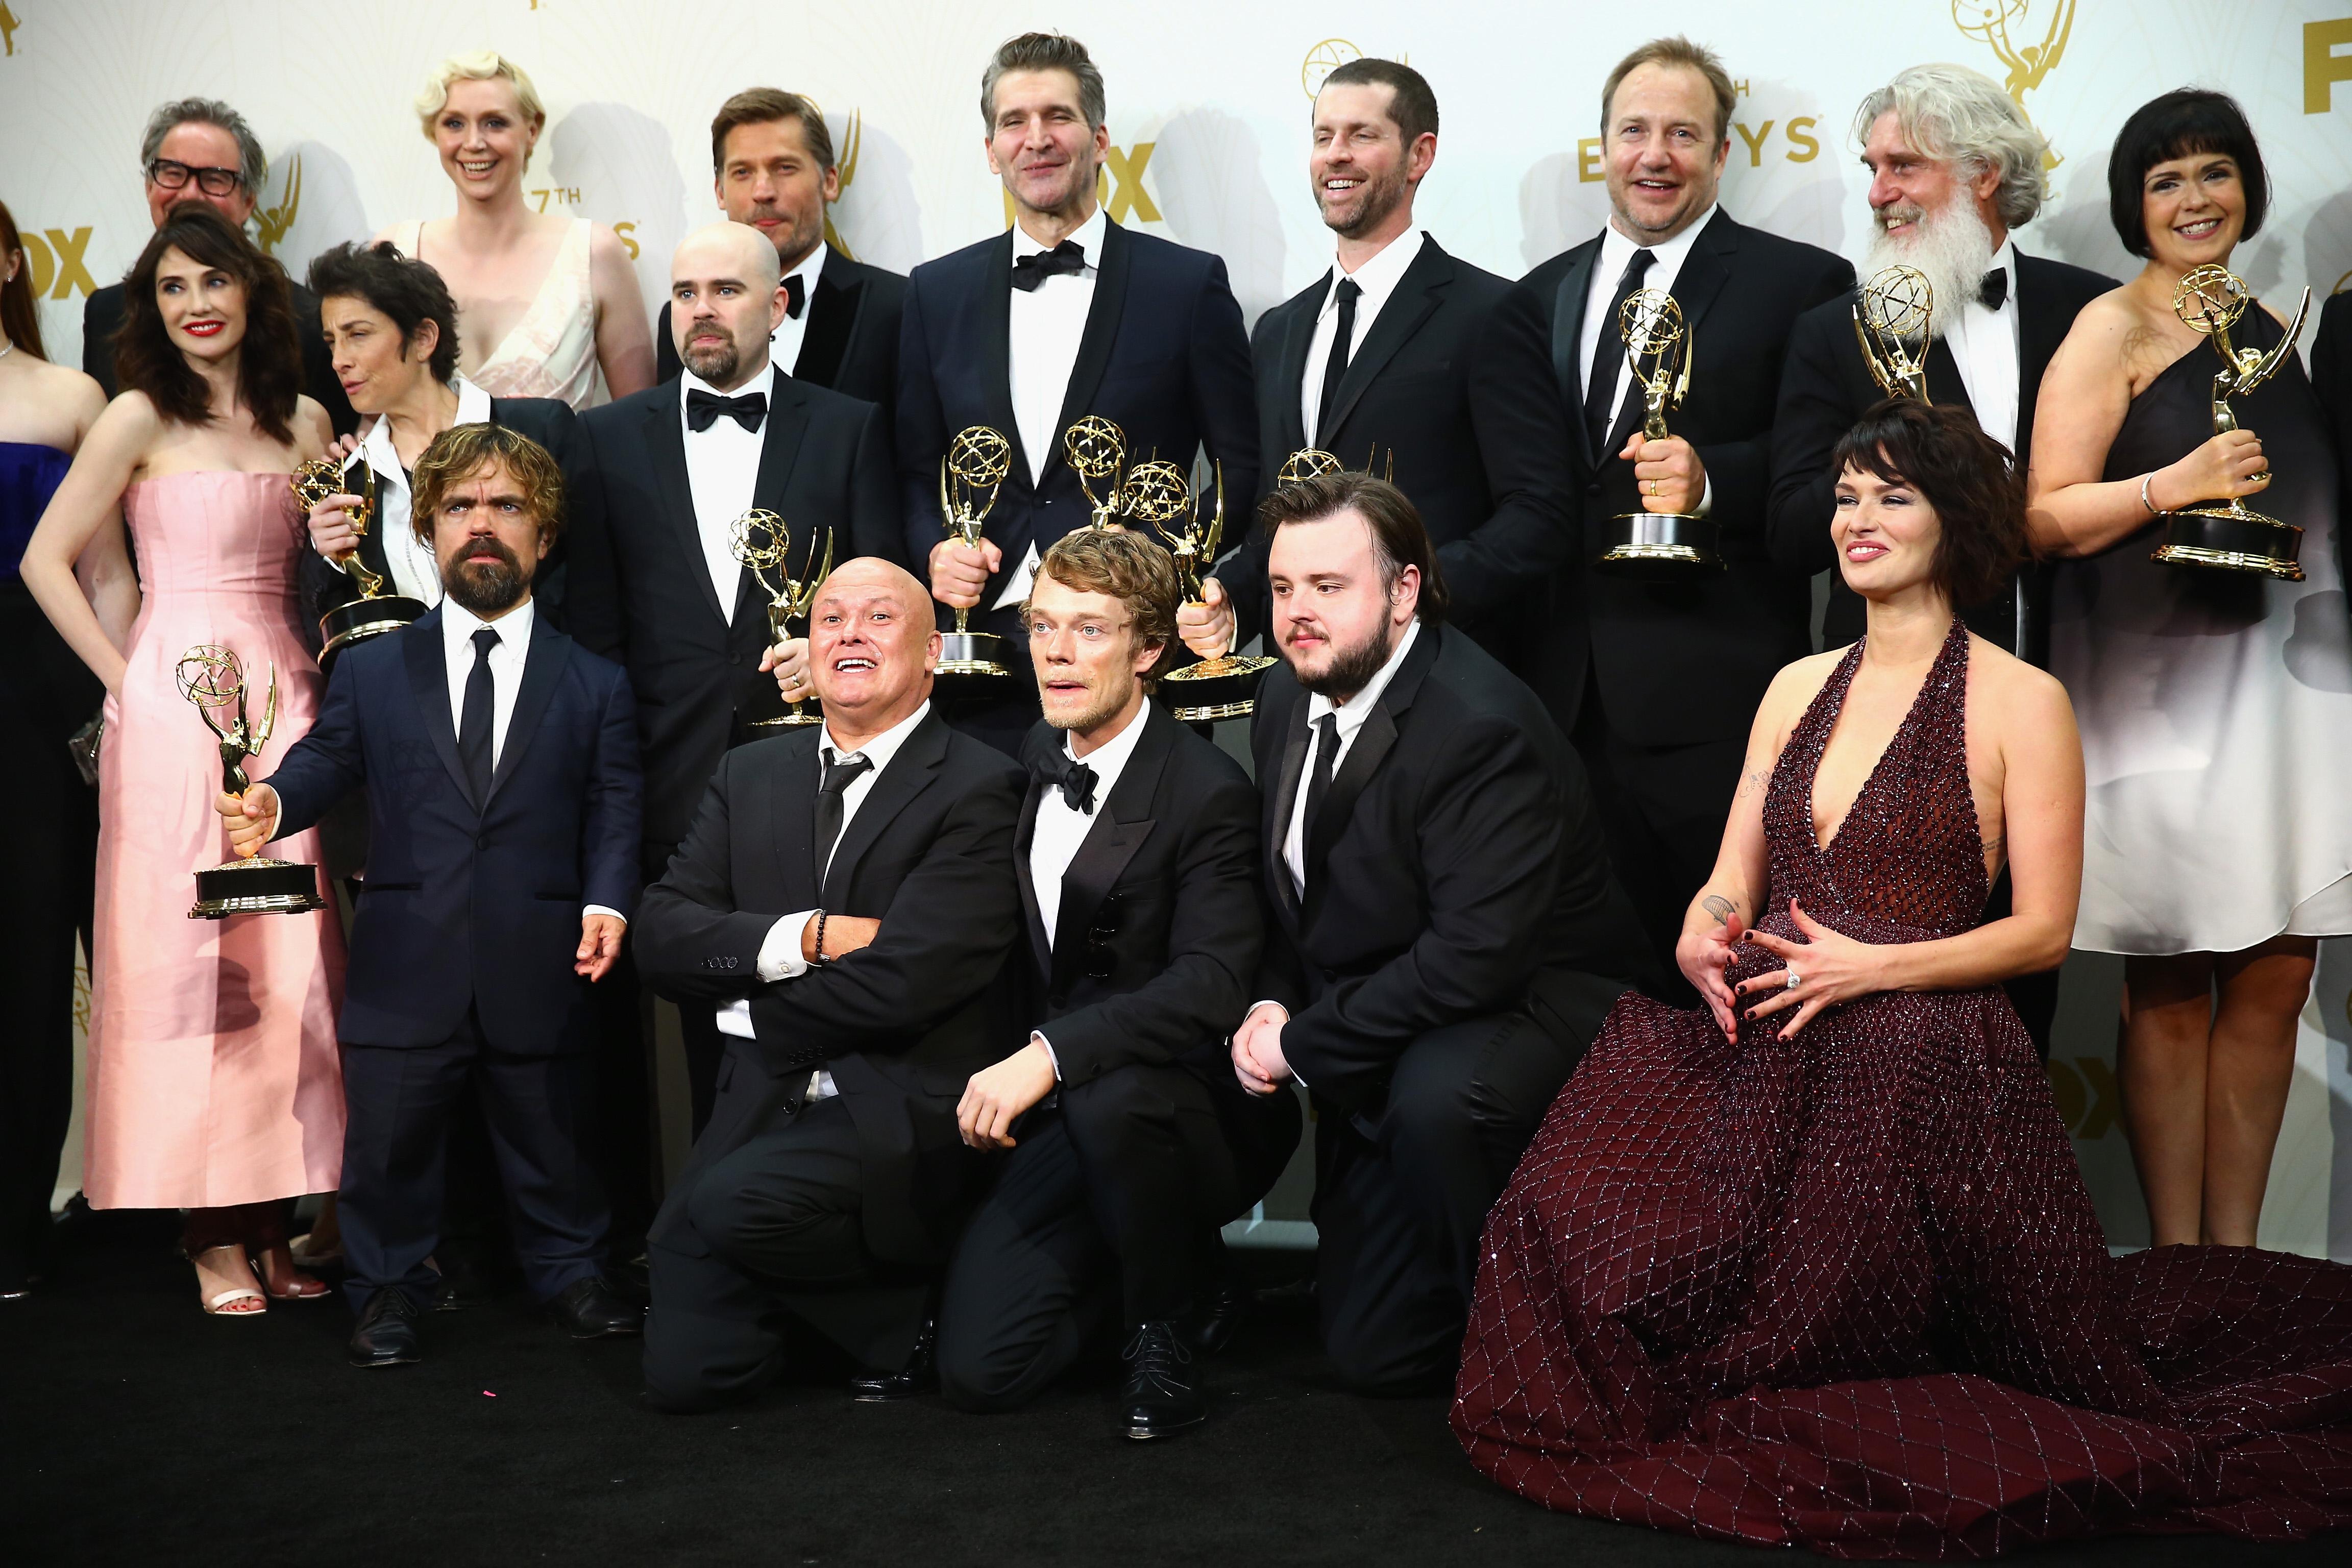 How 'Game Of Thrones' Fans Can Meet The Cast & Do Something ... on tudors cast, richard madden, natalie dormer, pedro pascal, peter dinklage, sophie turner, boardwalk empire cast, jacob anderson, lena headey, the shield cast, harry lloyd, alfie allen, richard madden, kit harington, breaking bad cast, kevin keenan, fringe cast, a game of thrones, gemma whelan, orange is the new black cast, dean-charles chapman, shameless cast, sophie turner, diana rigg, tim loane, revenge cast, michelle fairley, spartacus cast, bones cast, rose leslie, sons of anarchy cast, under the dome cast, maisie williams, rory mccann, jason momoa, once upon a time, kristofer hivju, aidan gillen, jack gleeson, harry lloyd, jerome flynn, thomas brodie-sangster, the borgias cast, sean bean, samantha bentley, indira varma, natalie dormer, aidan gillen, rory mccann, nikolaj coster waldau, robert aramayo, hafþór júlíus björnsson, mark addy, carice van houten, walking dead cast, kristian nairn, iain glen, jason momoa, joe dempsie, nikolaj coster-waldau, gwendoline christie, sean bean, game of thrones - season 2, liam cunningham, hannah murray, oona chaplin, charles dance, white collar cast, the originals cast, a song of ice and fire, natalia tena, game of thrones - season 1, stephen dillane, winter is coming, sibel kekilli, john bradley, iwan rheon, michiel huisman, conleth hill, james cosmo, the walking dead, rosabell laurenti sellers, true blood cast, the good wife cast, katie alexander thom, once upon a time cast, isaac hempstead wright, downton abbey cast, lena headey, nathalie emmanuel, iain glen, finn jones, emilia clarke,